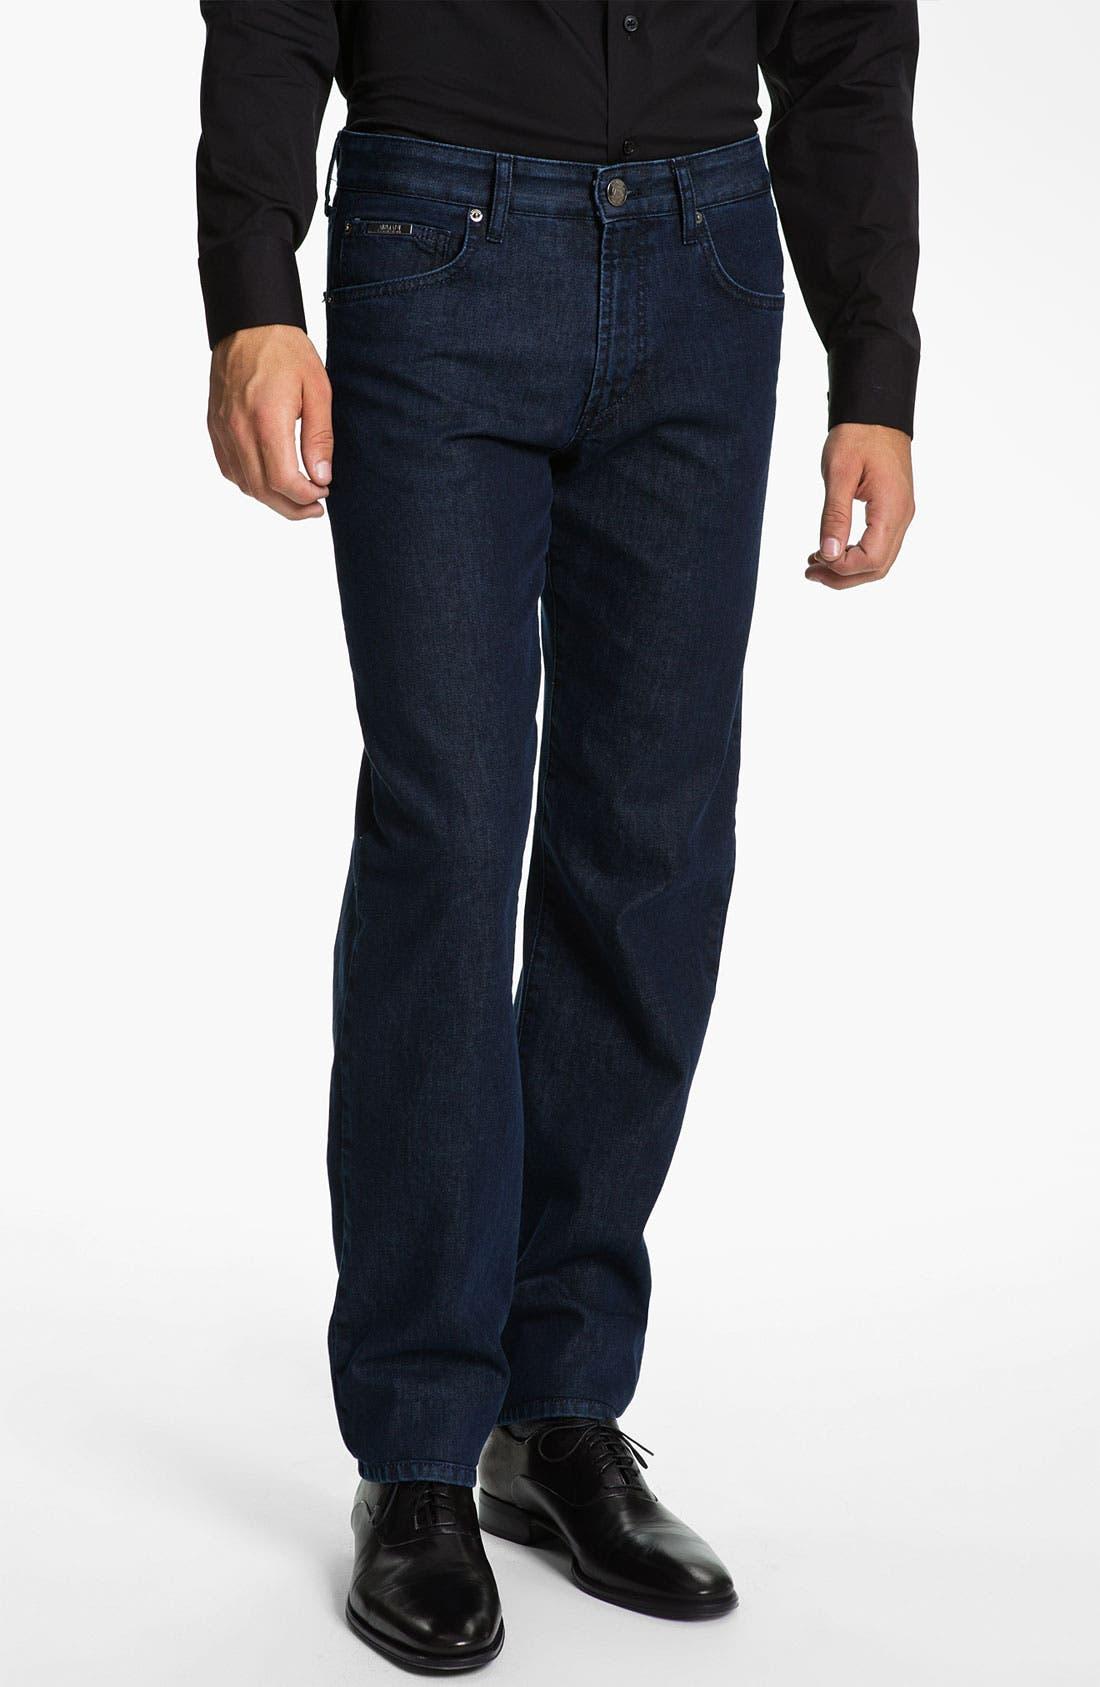 Alternate Image 1 Selected - Armani Collezioni Straight Leg Jeans (Navy Wash)